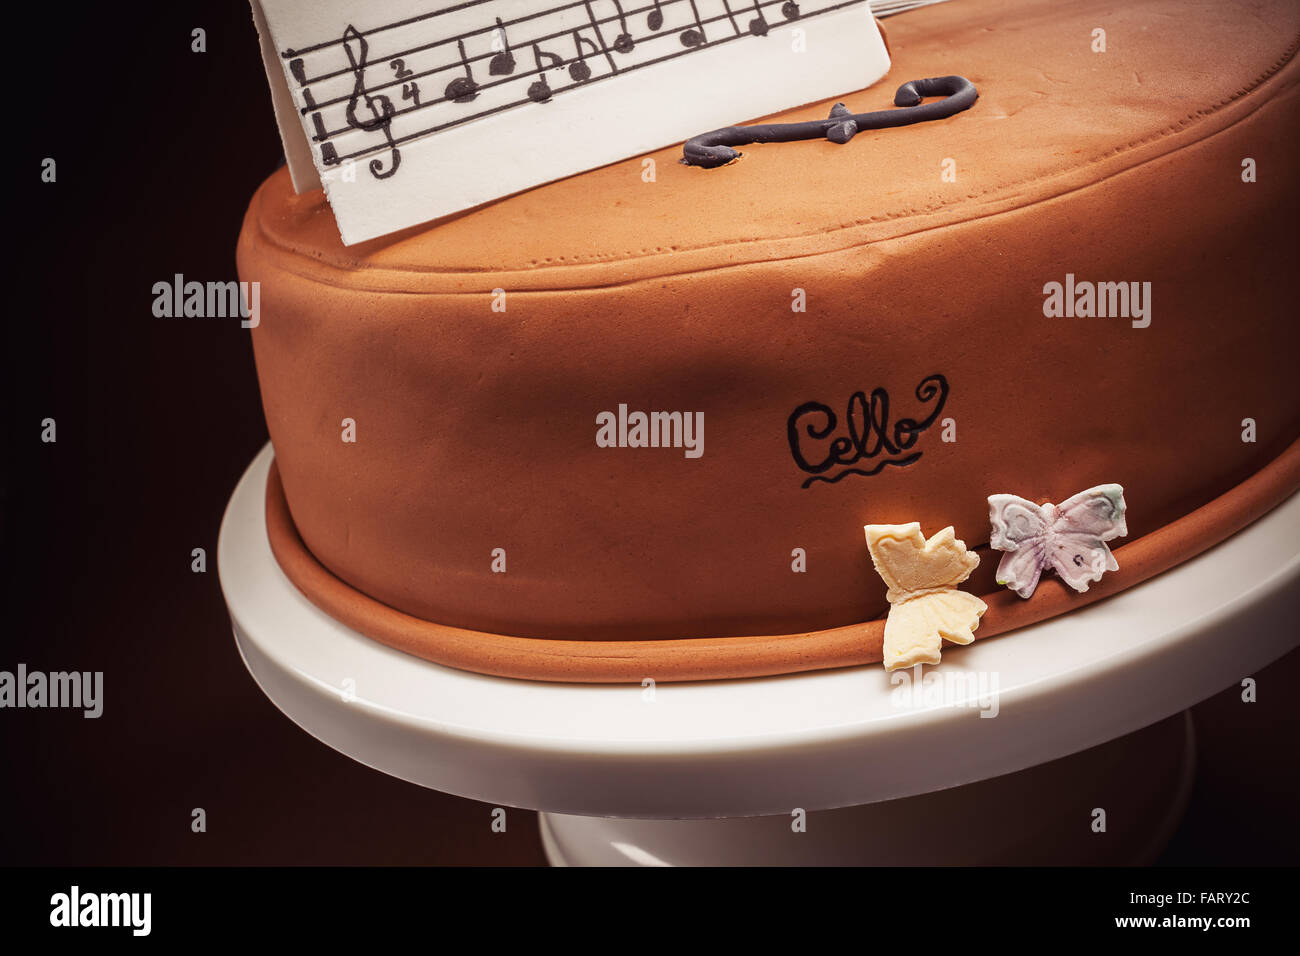 Birthday Cake Decorated With Fondant Rounded Symbolically Stock